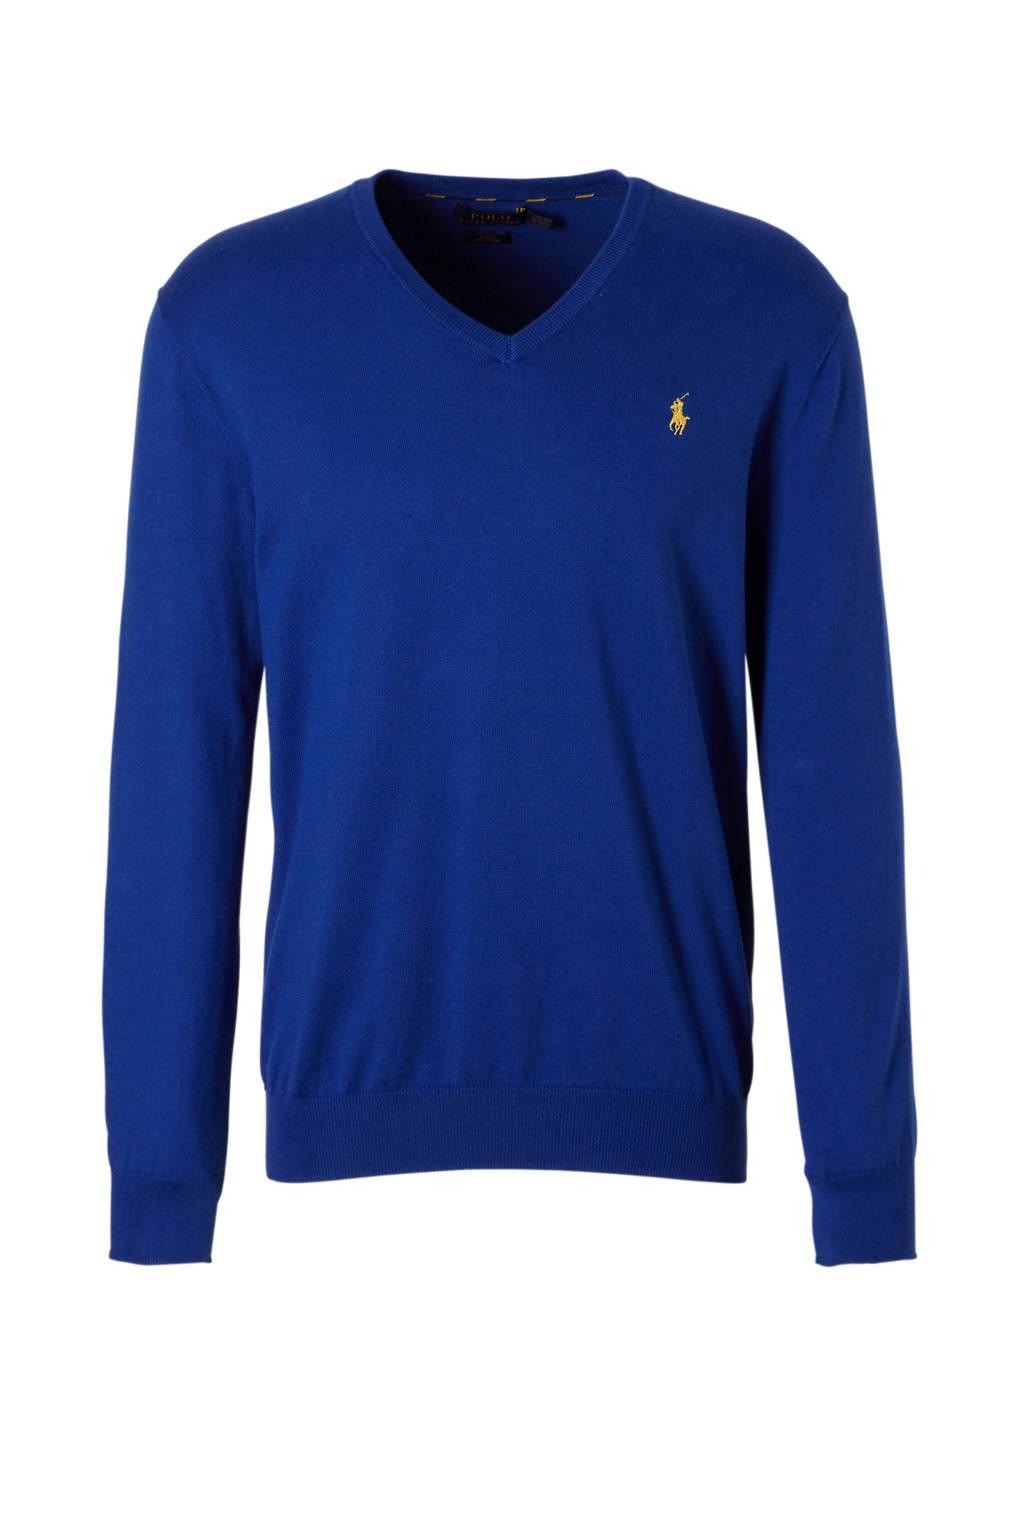 POLO Ralph Lauren trui, Donkerblauw